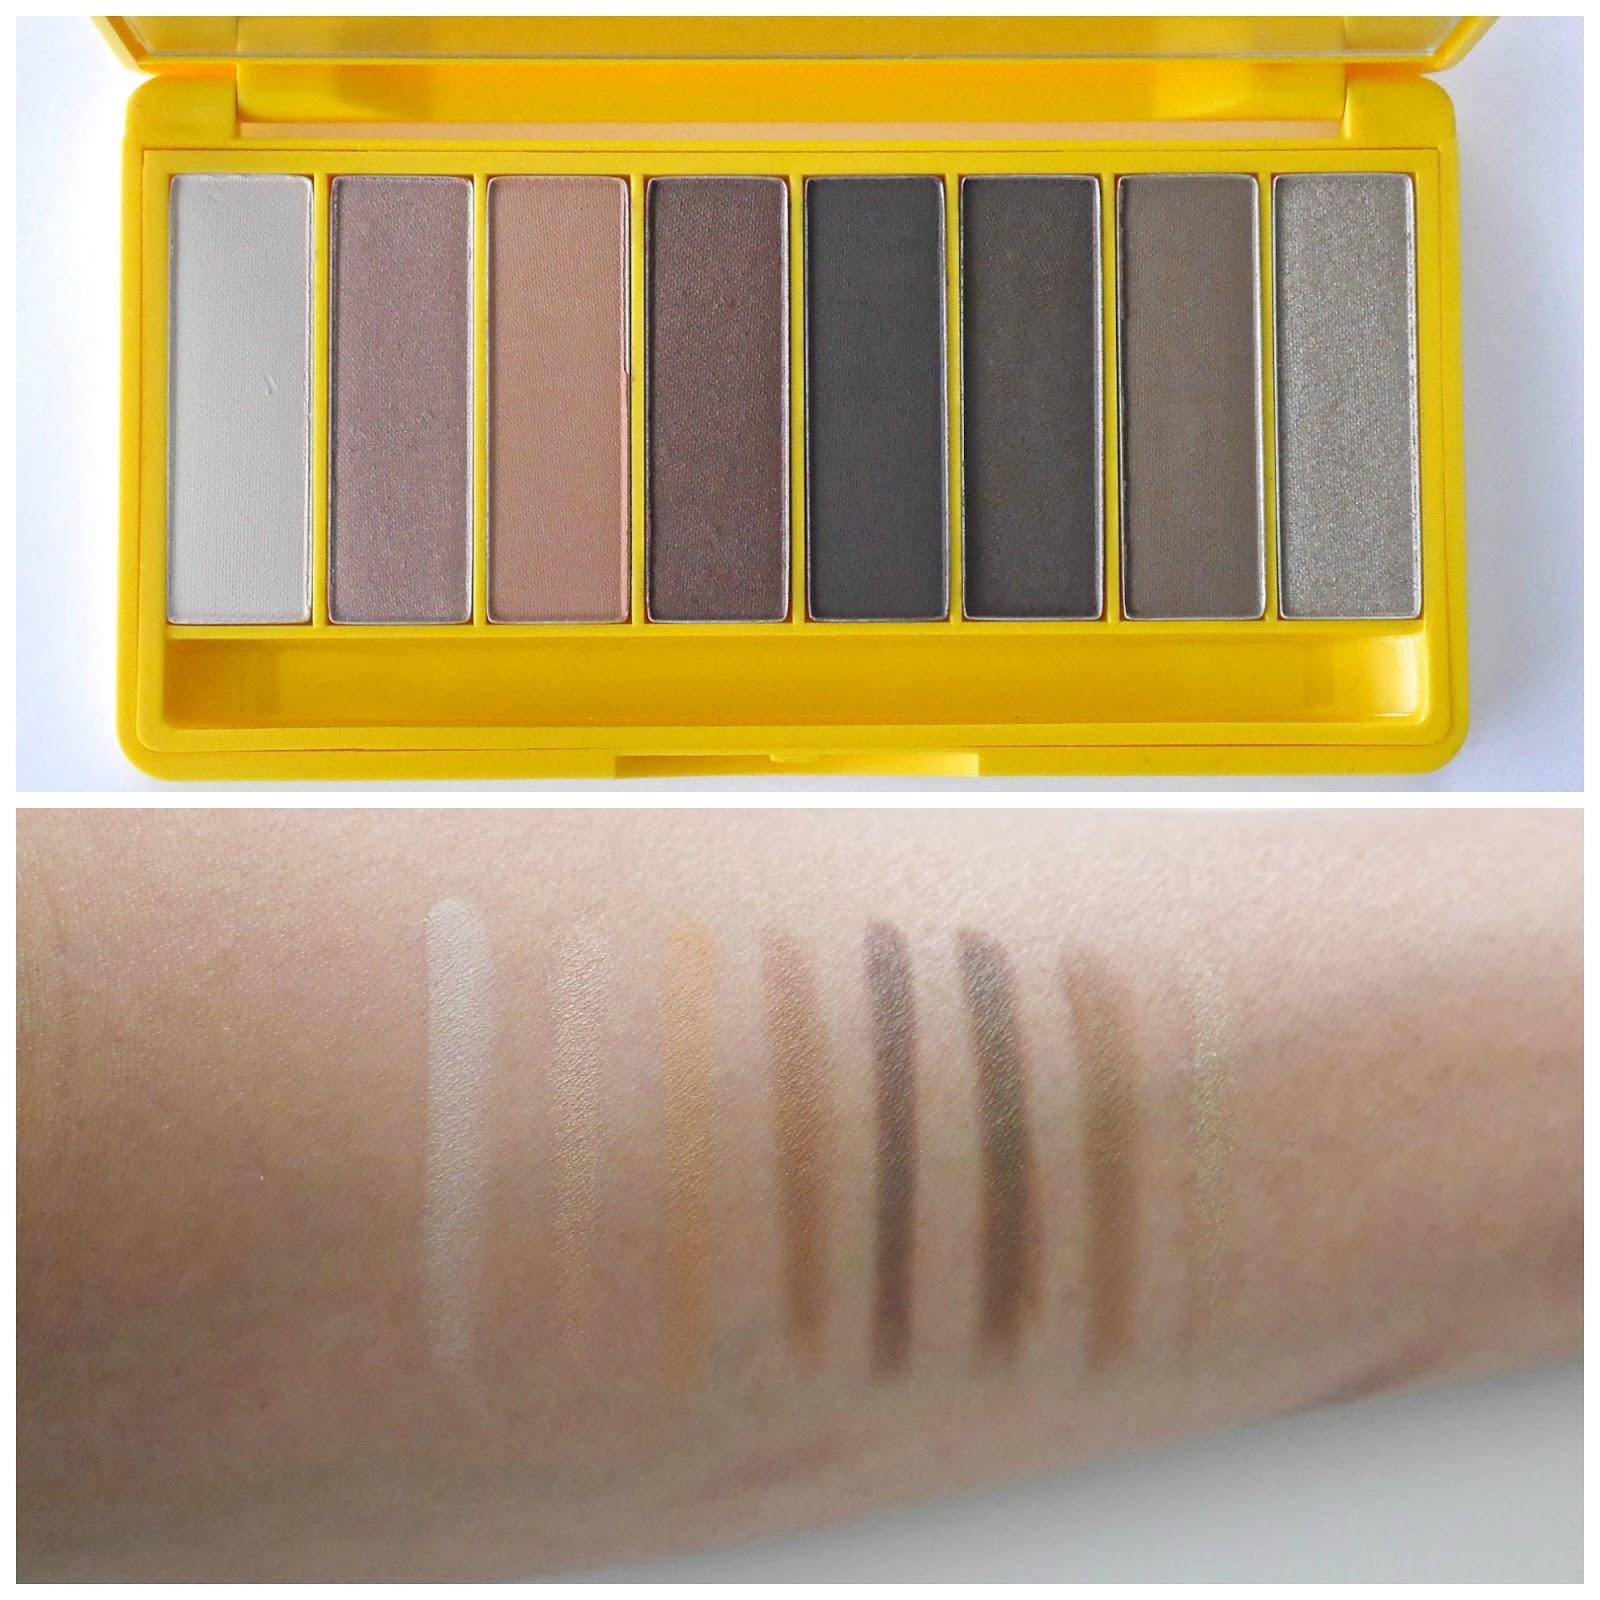 korean skincare, asian skincare, asian beauty, hand creams, makeup, eyeshadow palette, drugstore